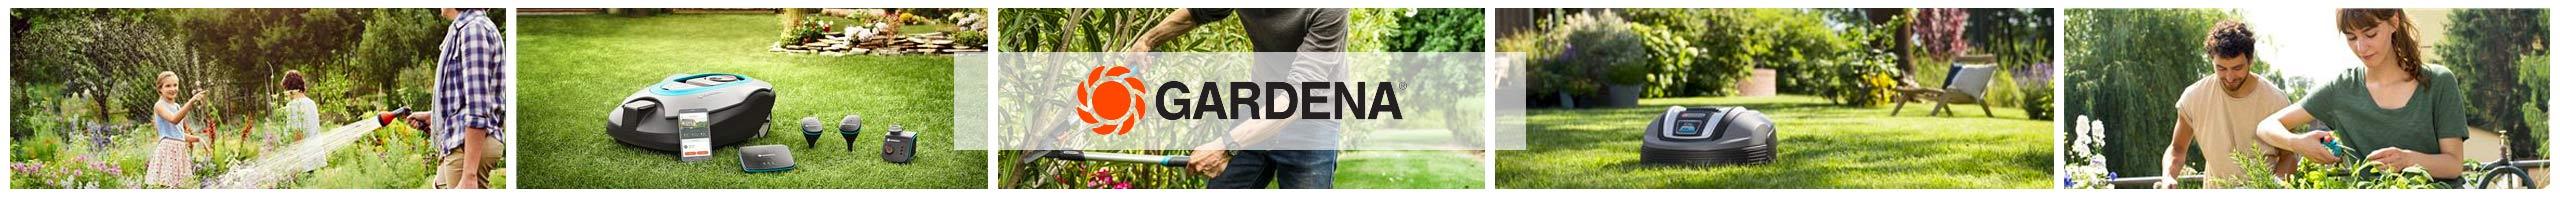 Test et avis outil Gardena jardin pas cher